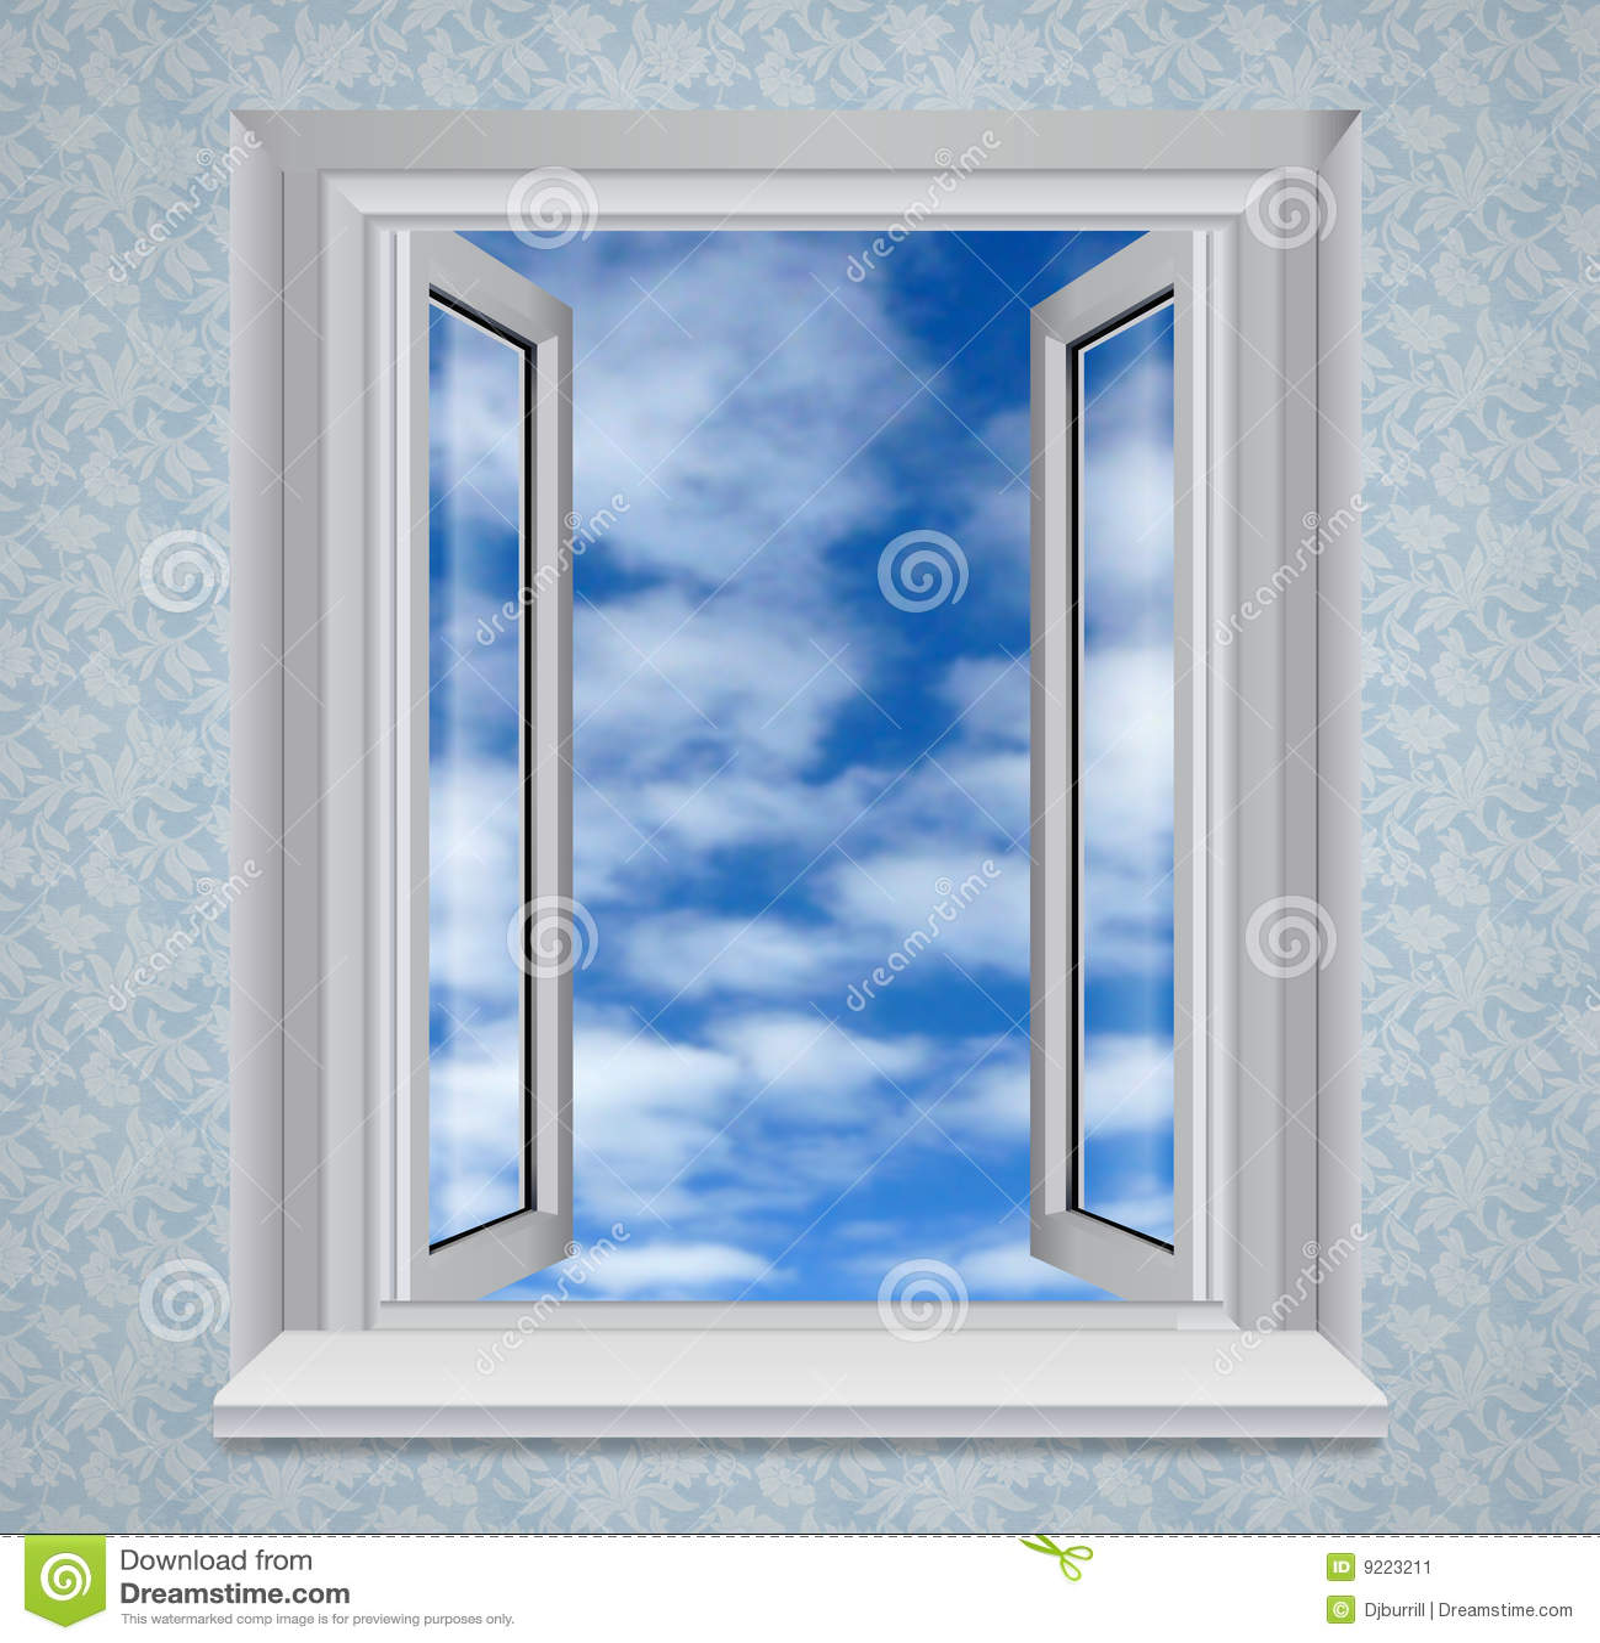 Offenes fenster himmel  Geöffnetes Fenster Zum Blauen Himmel Stockbild - Bild: 9223211